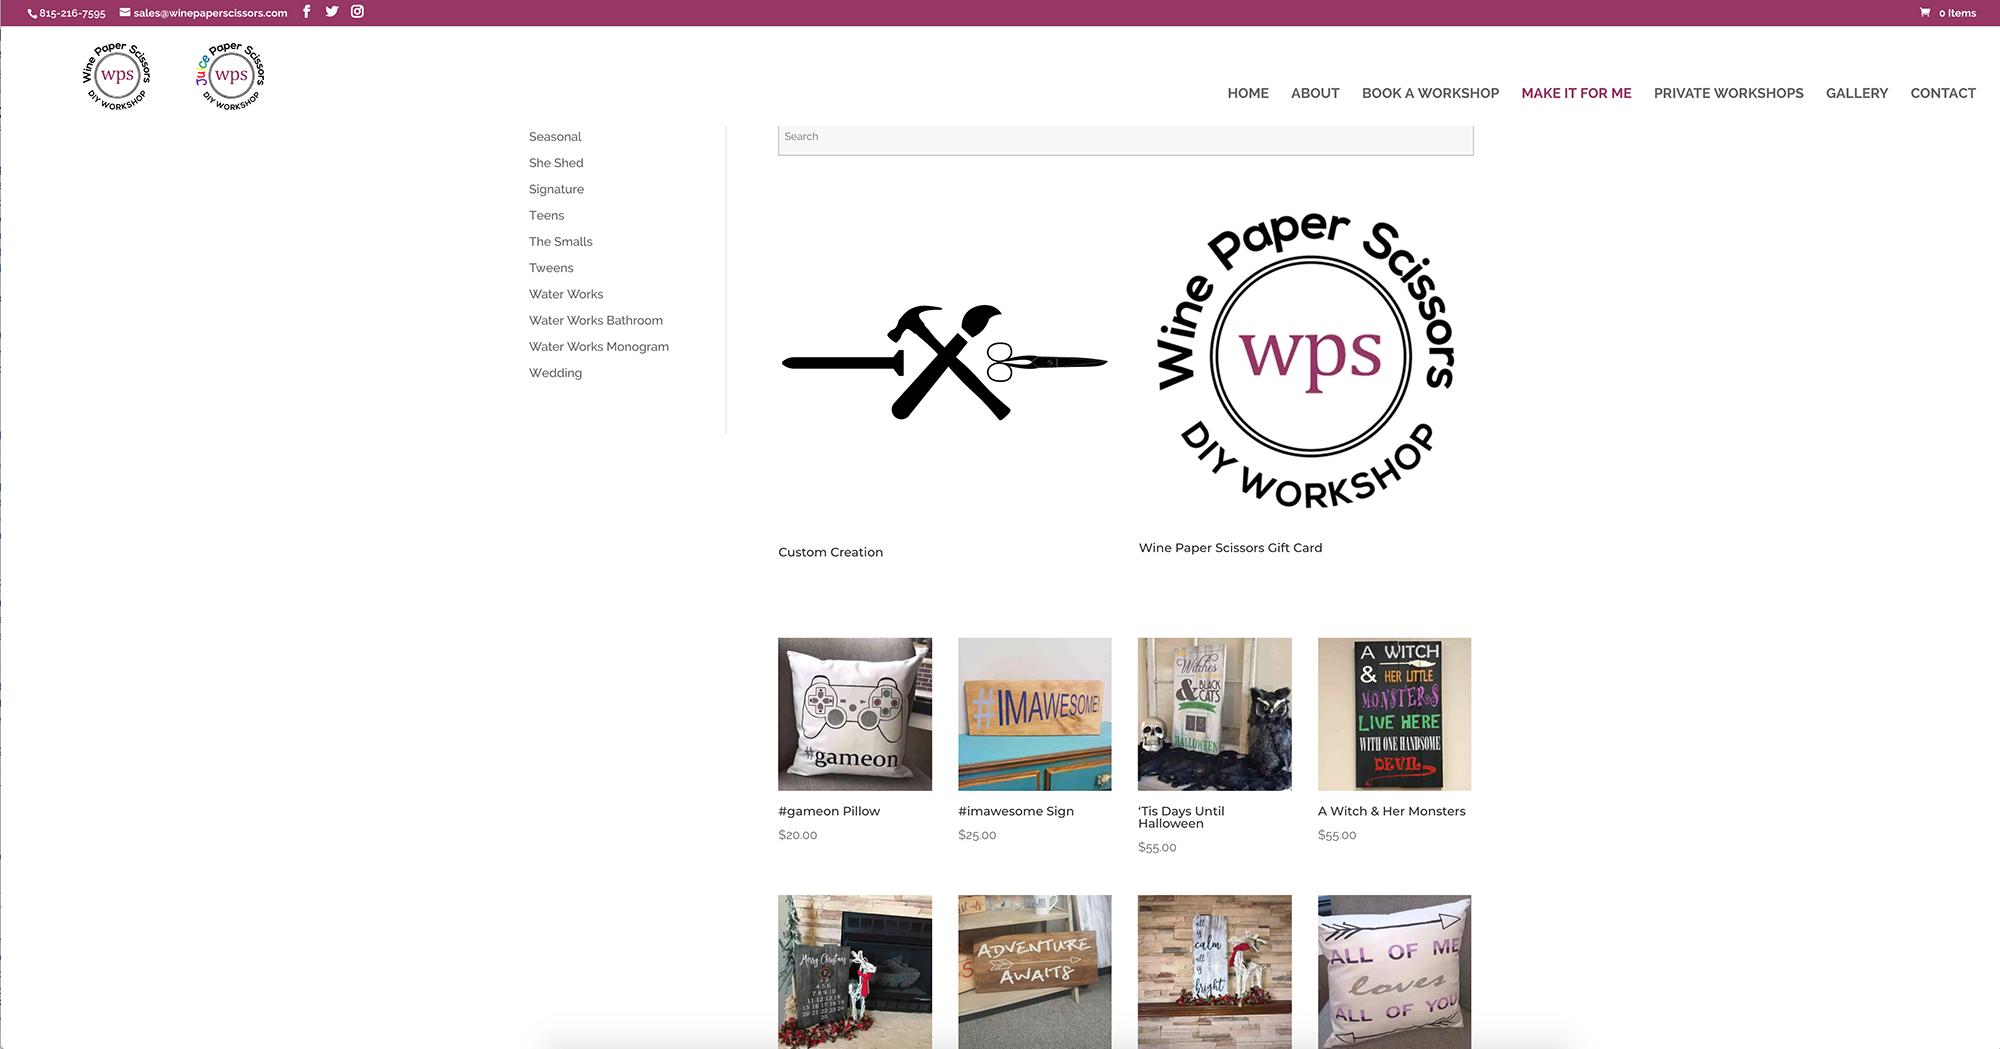 Wine Paper Scissors Make It For Me website